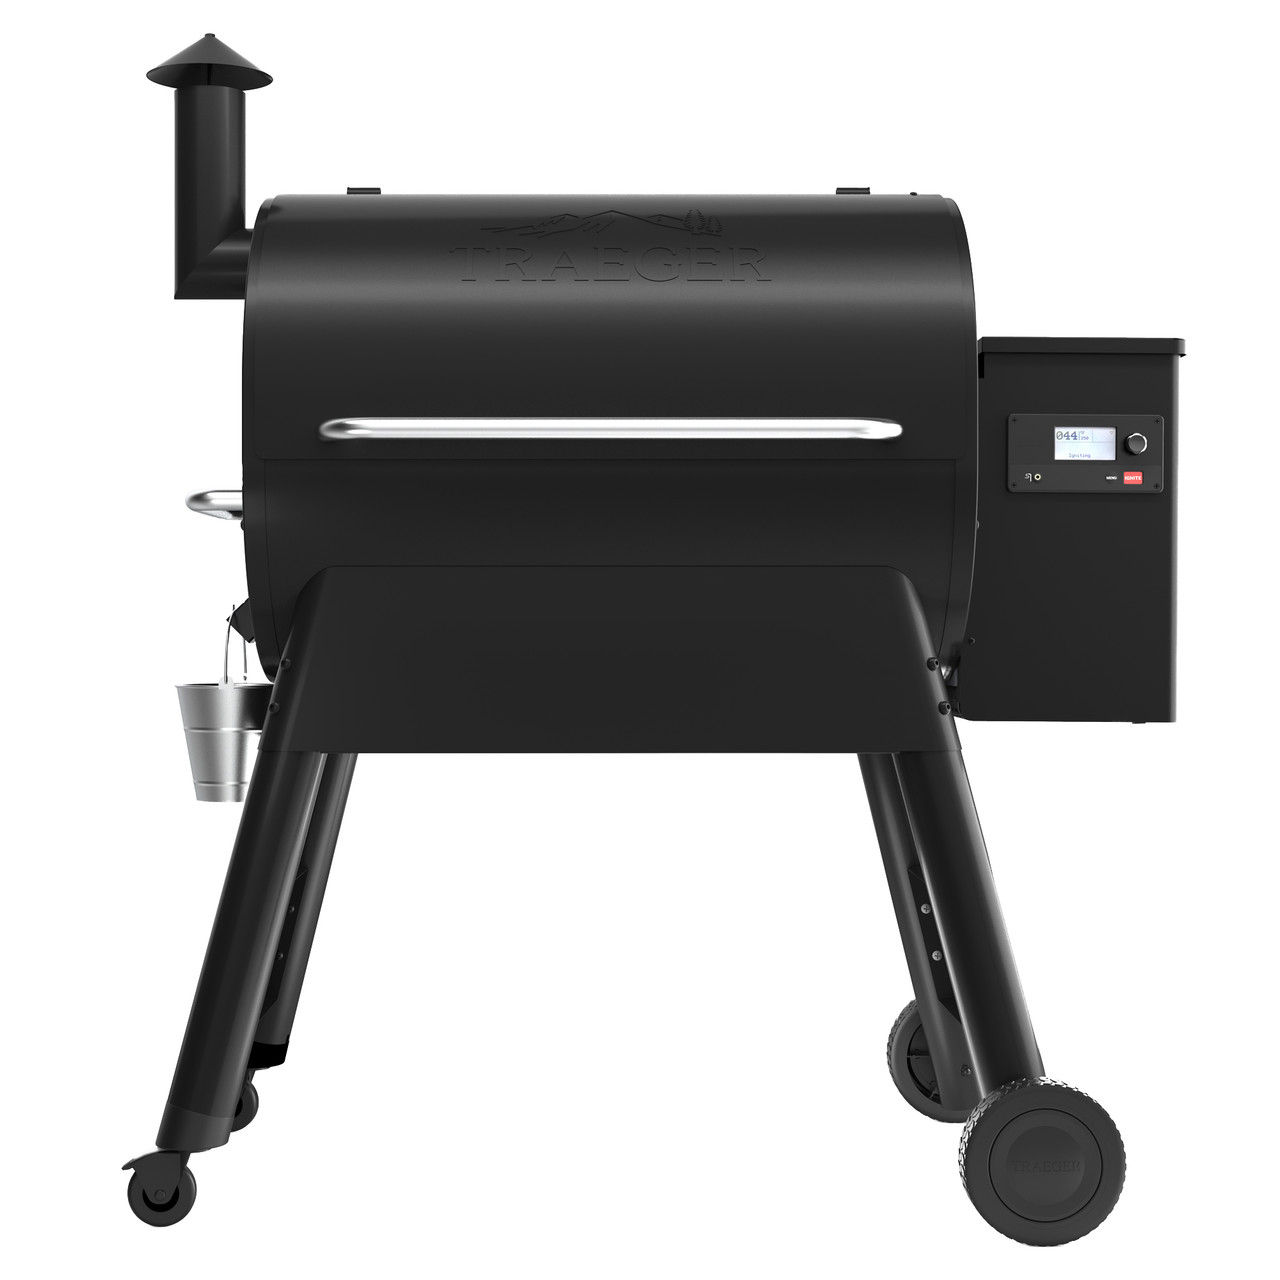 TRAEGER TFB78GLE Pro Series 780 Pellet Grill - Black